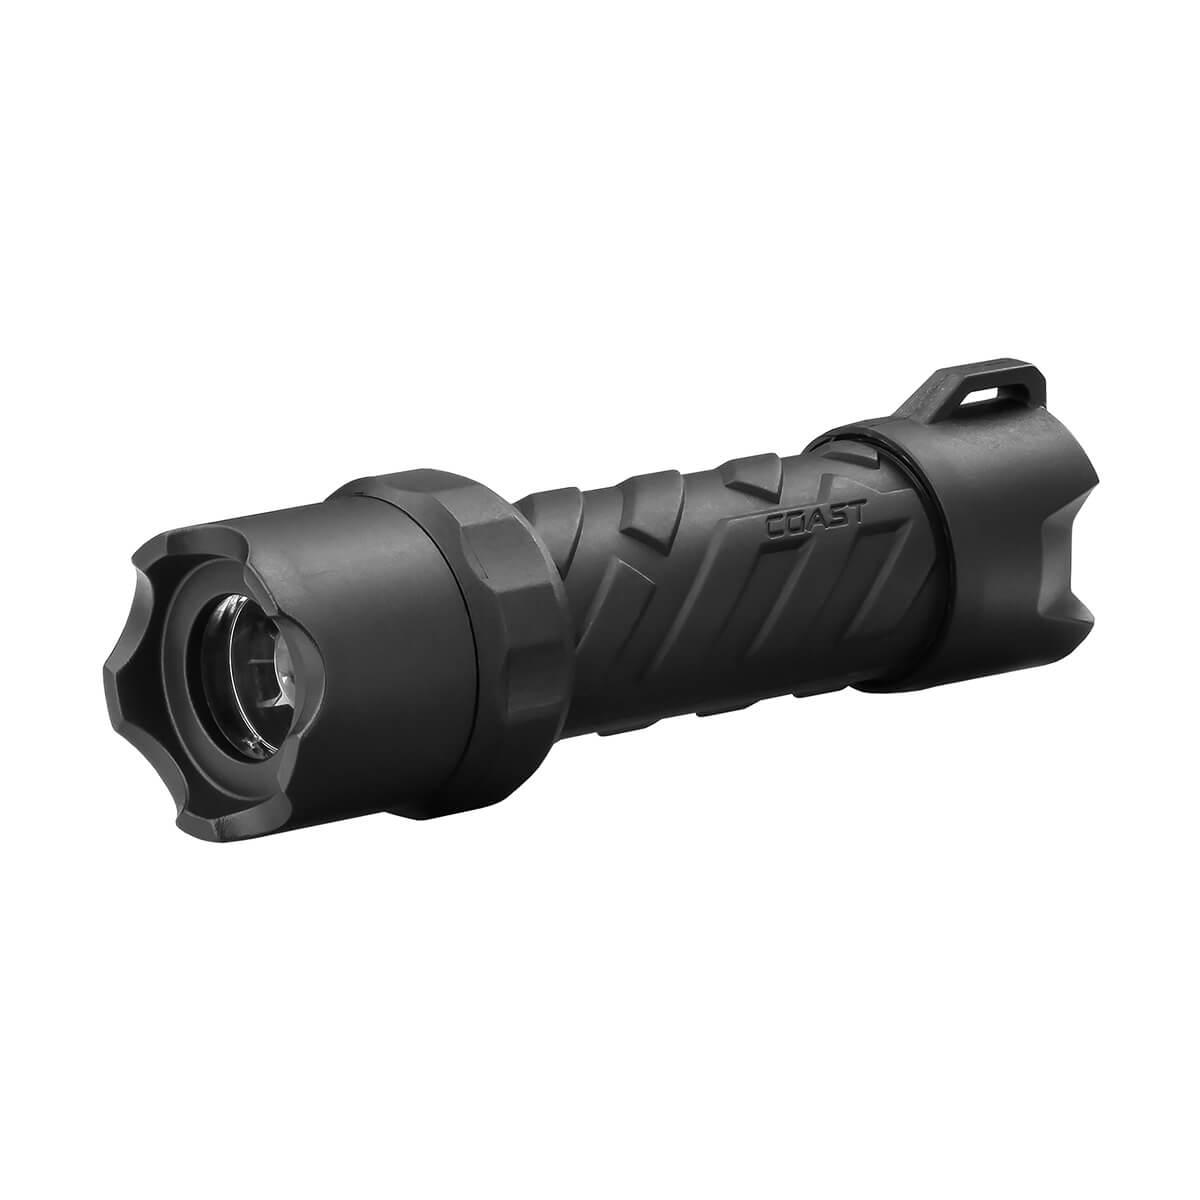 Coast 320-Lumen Flashlight (Battery Included)